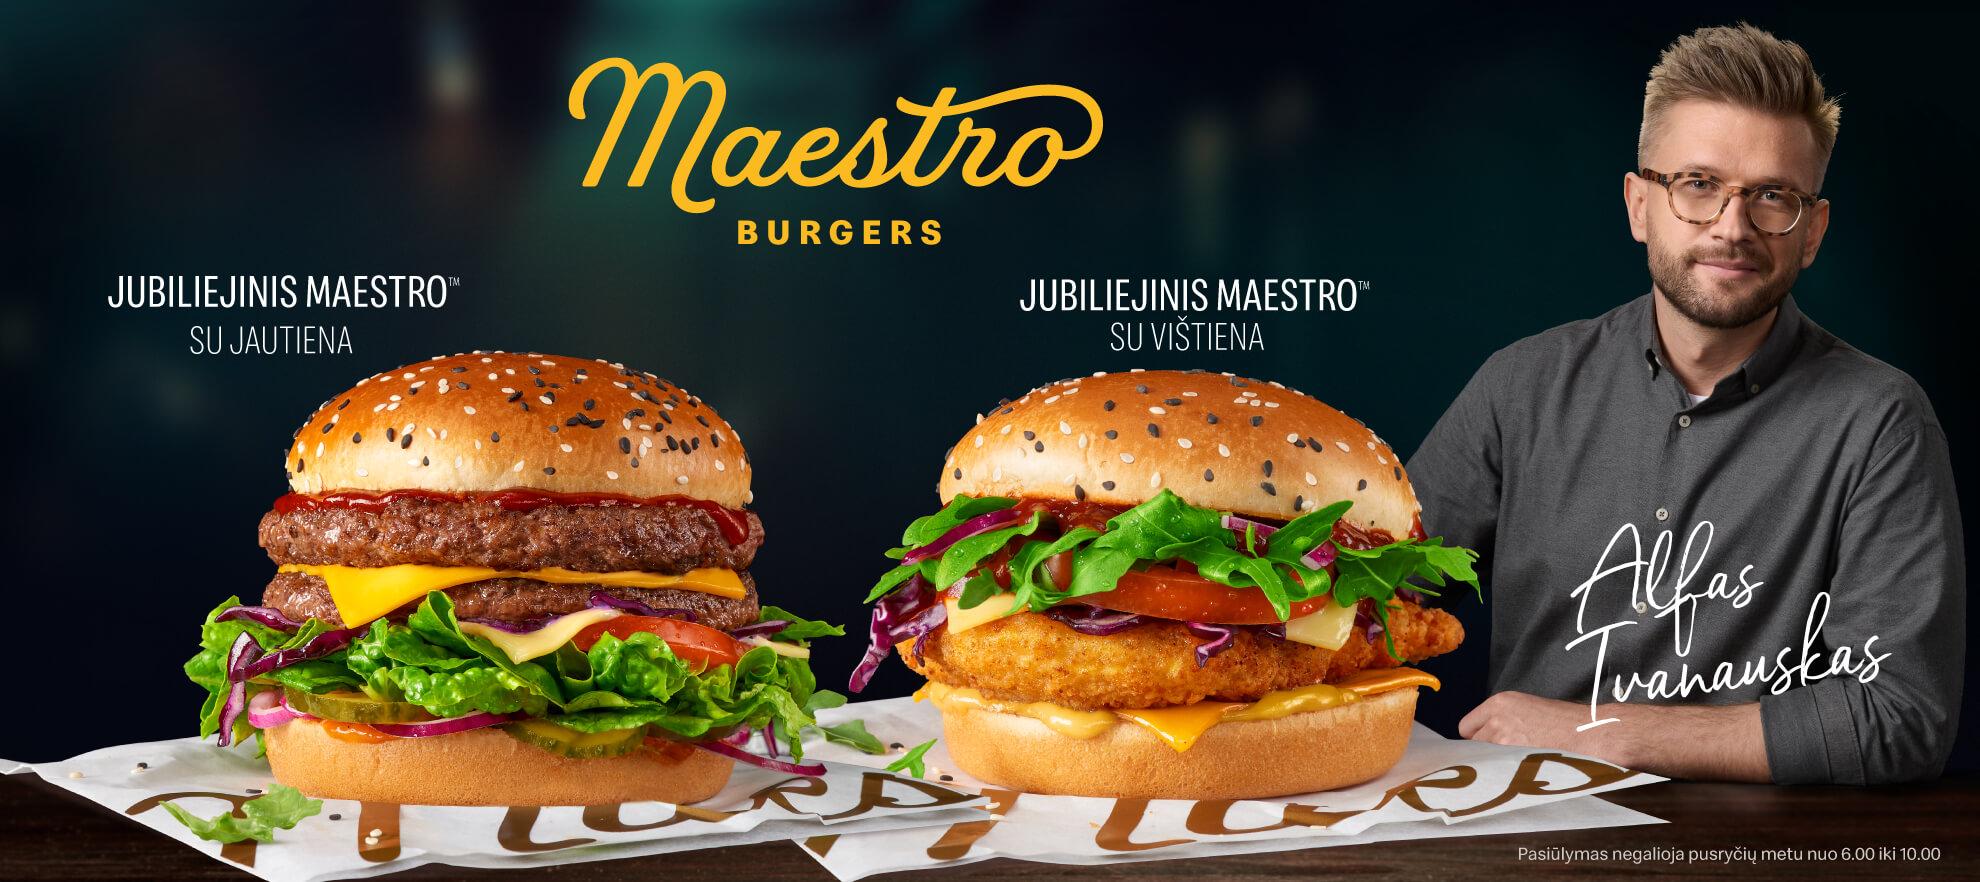 McD_Maestro21_Desctop_1980x880_LT